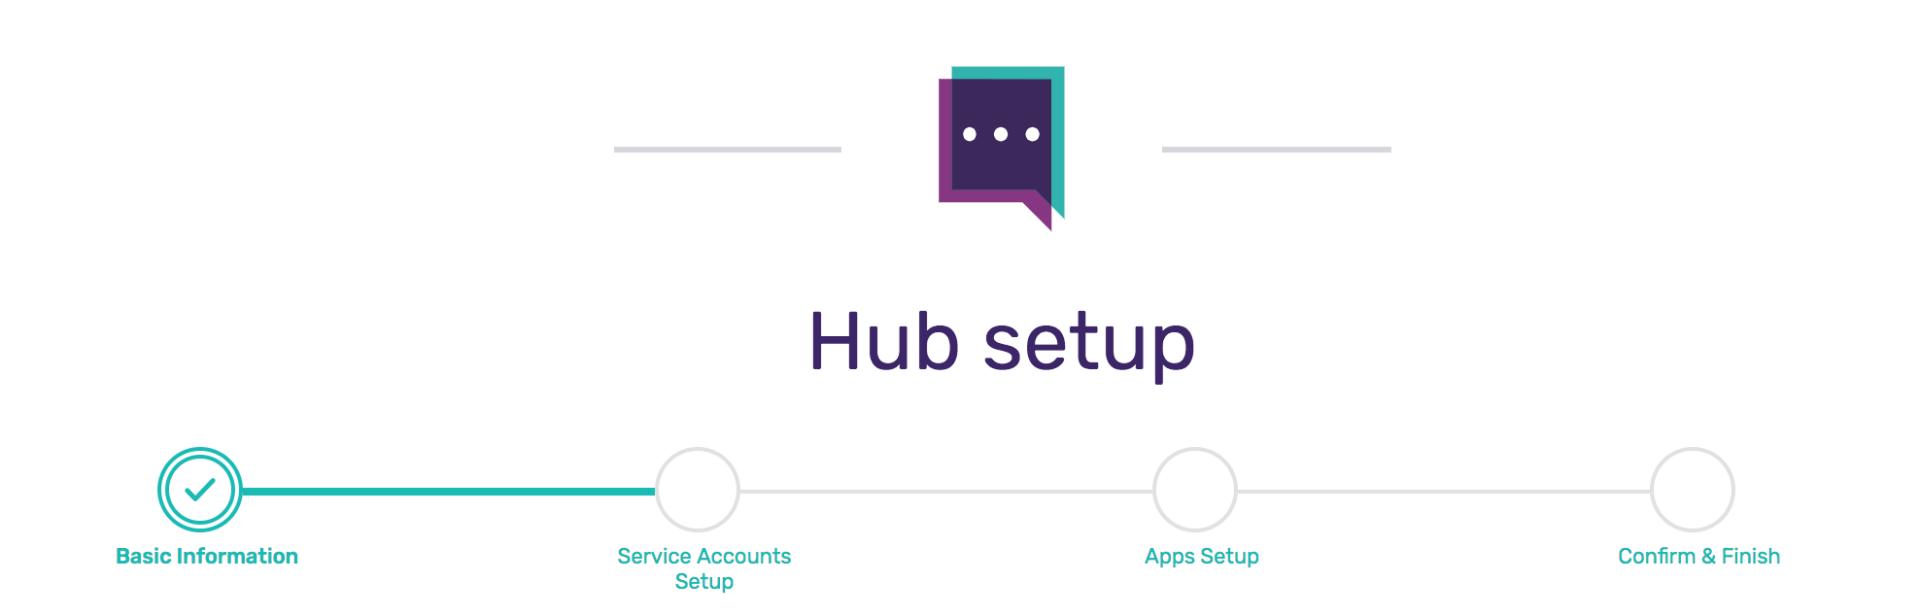 Mio Hub setup